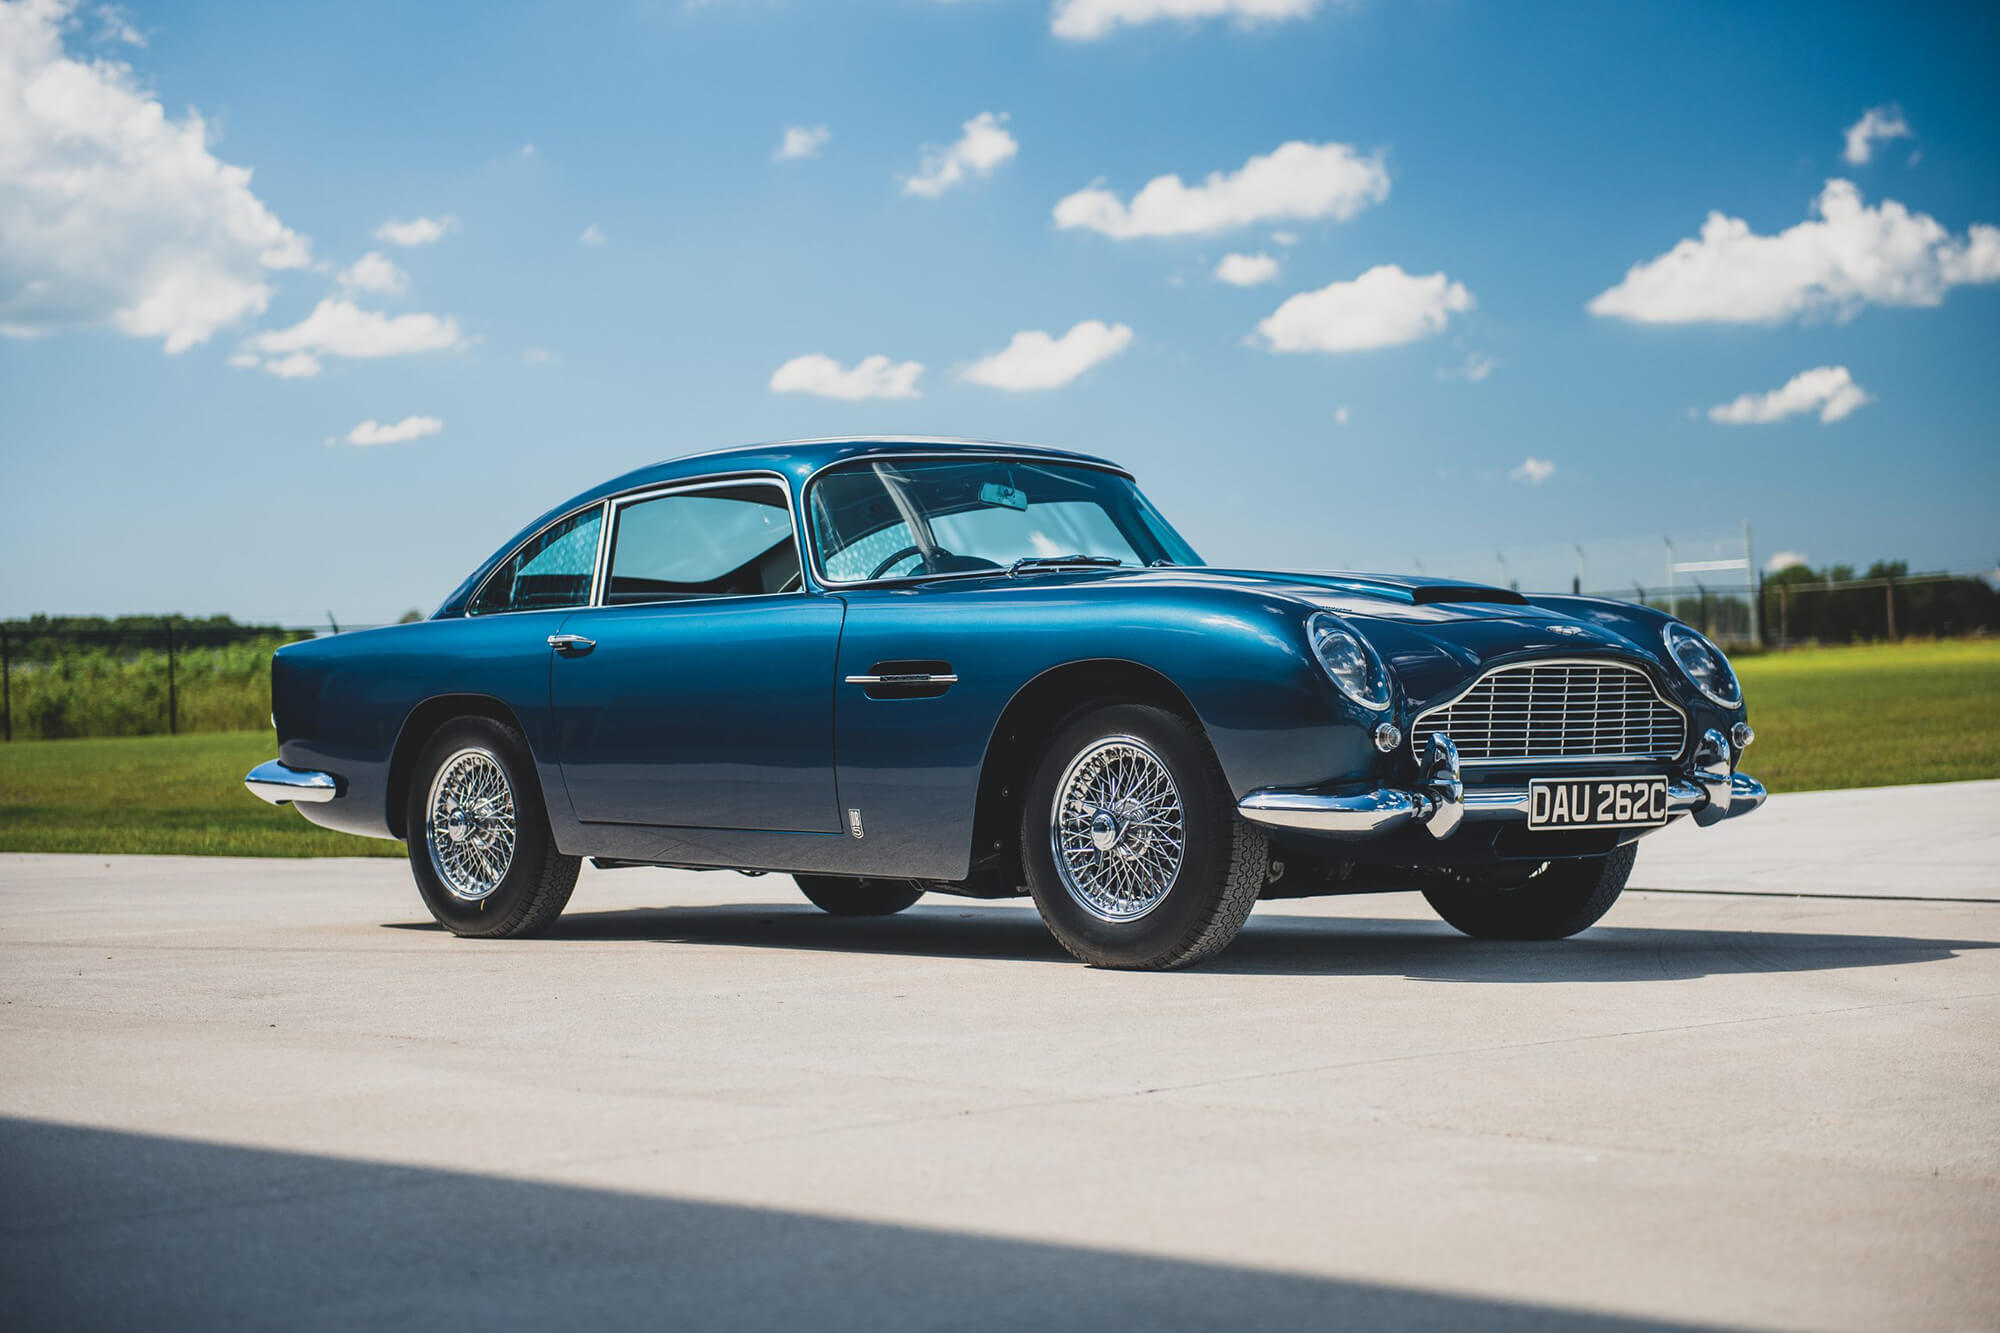 1964 Aston Martin DB5 Vantage